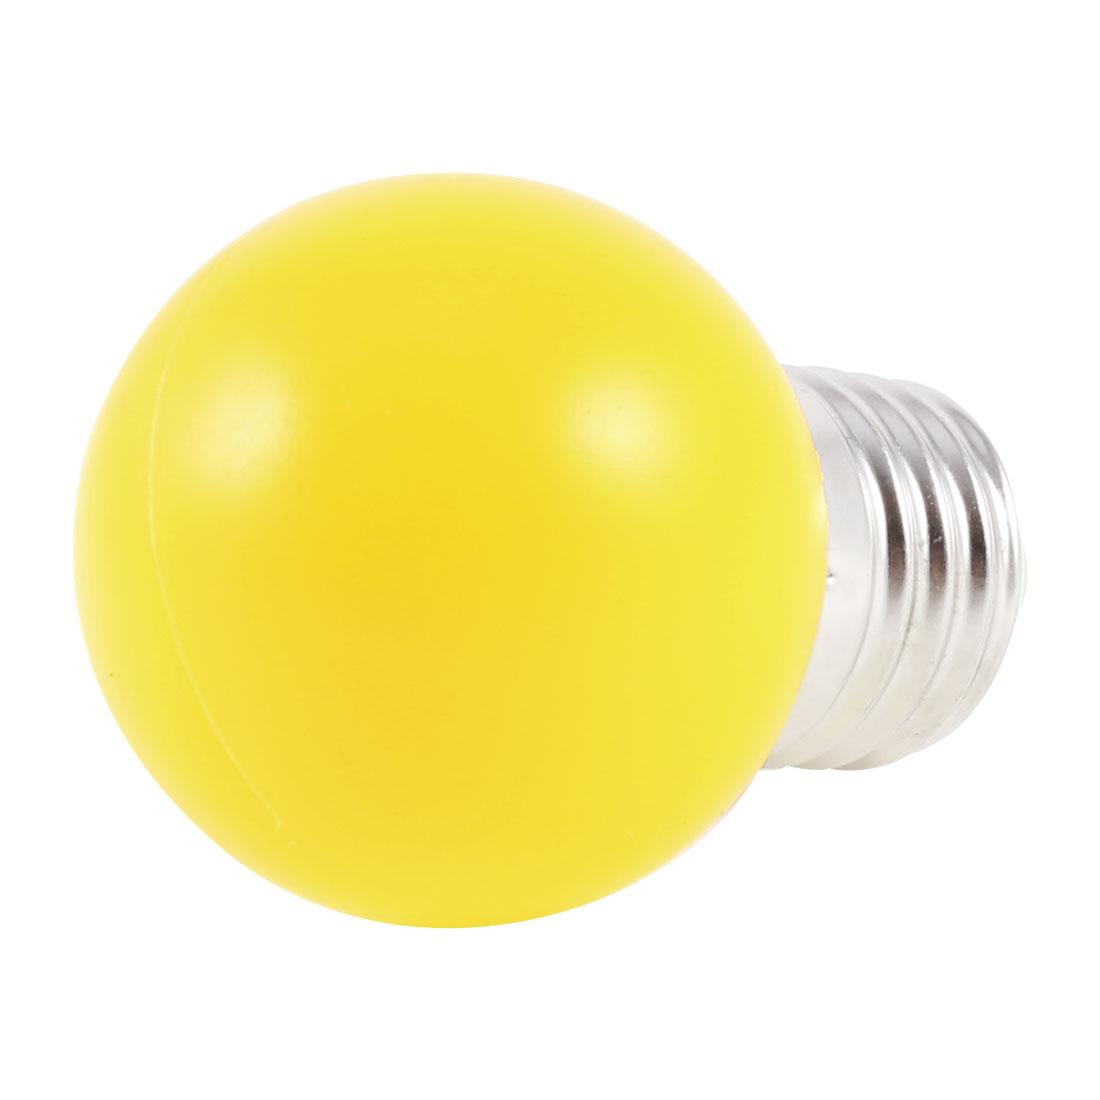 160-250V 1W Decorative Energy Saving Plastic Housing Yellow LED Lamp E27 Bulb